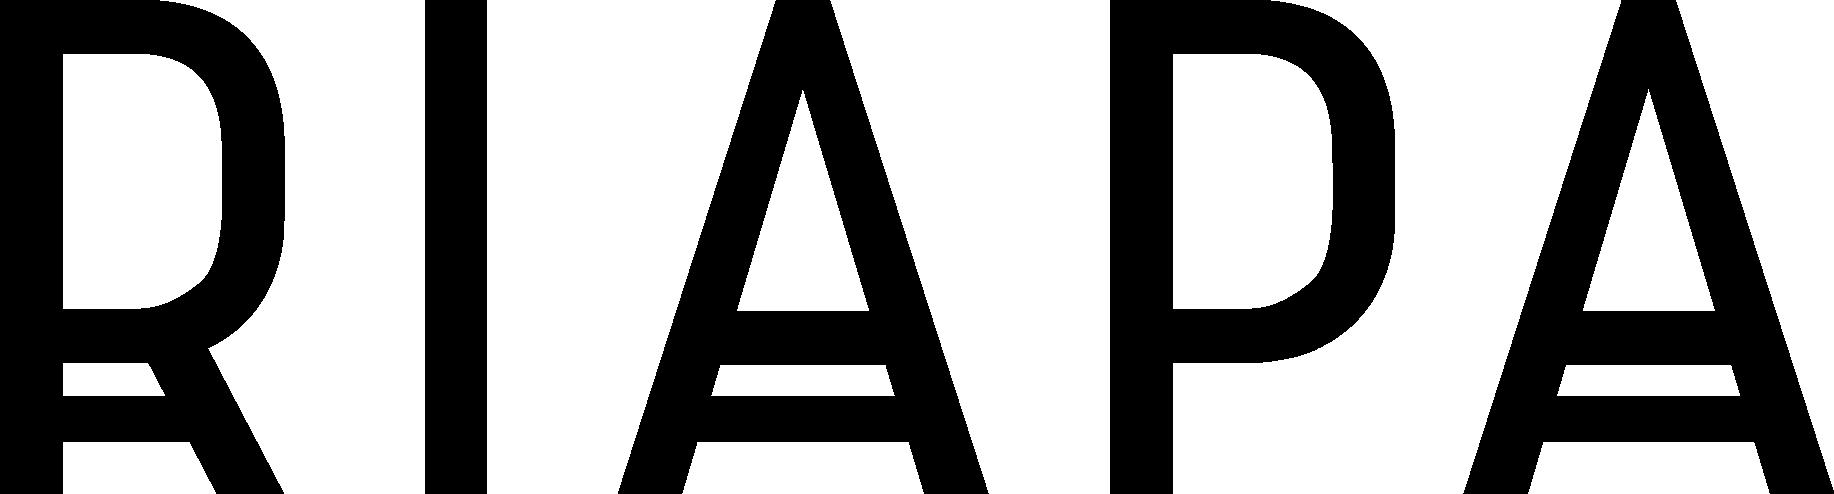 Anorak studio logo